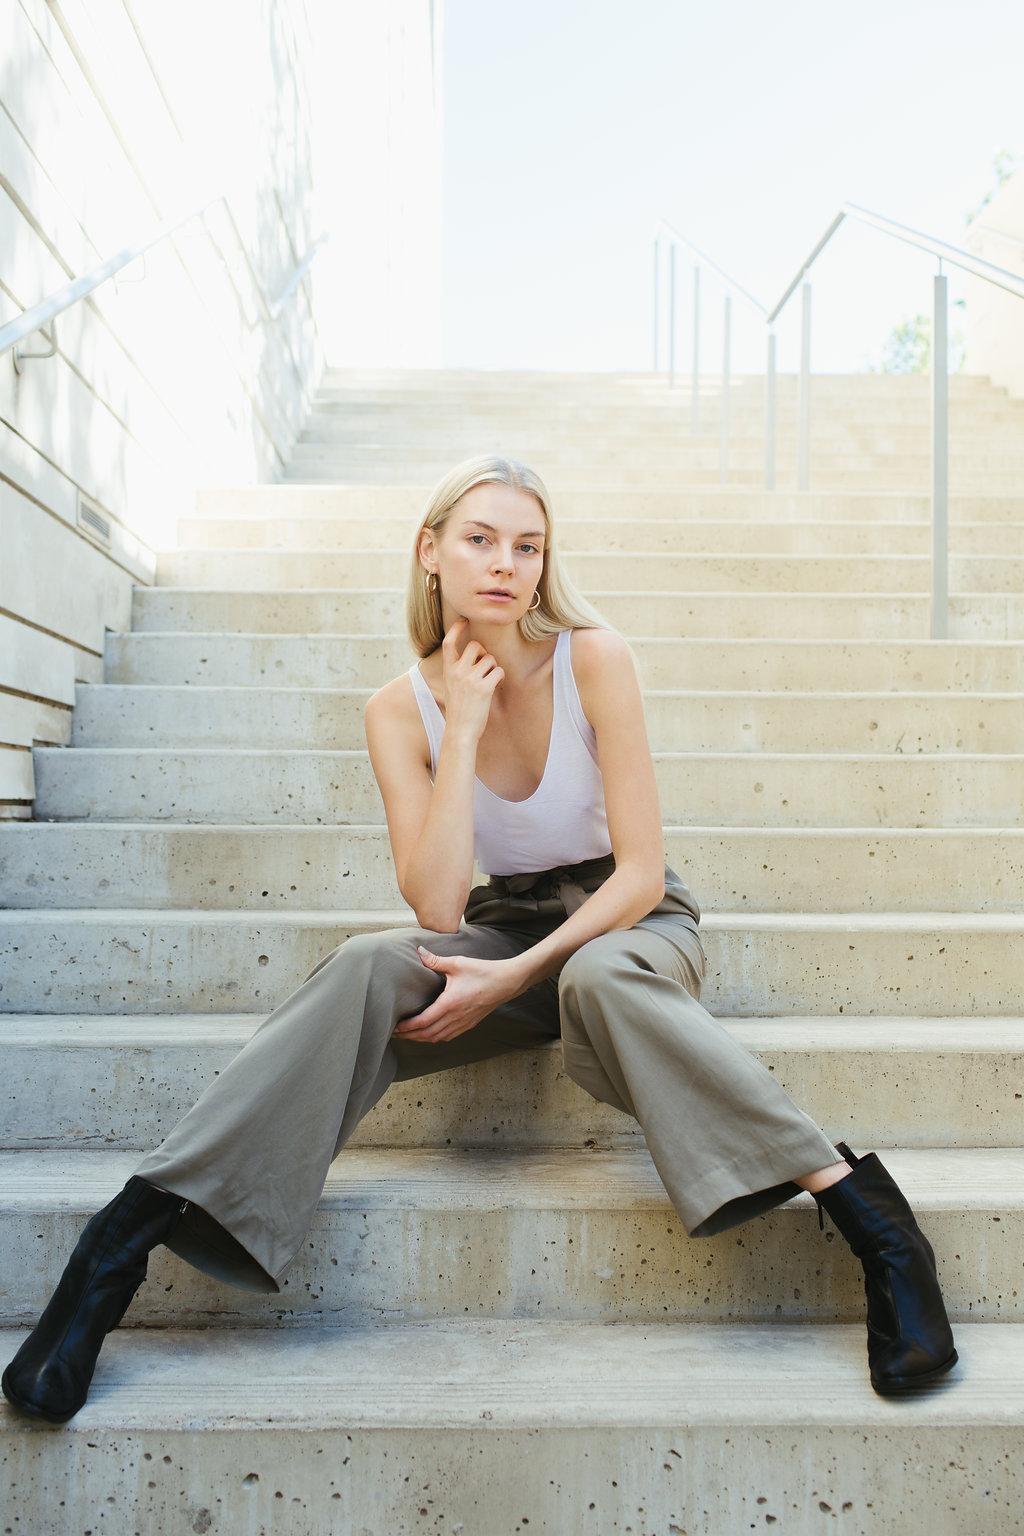 Paige-Newton-Austin-Model-Fashion-Photography0002.jpg